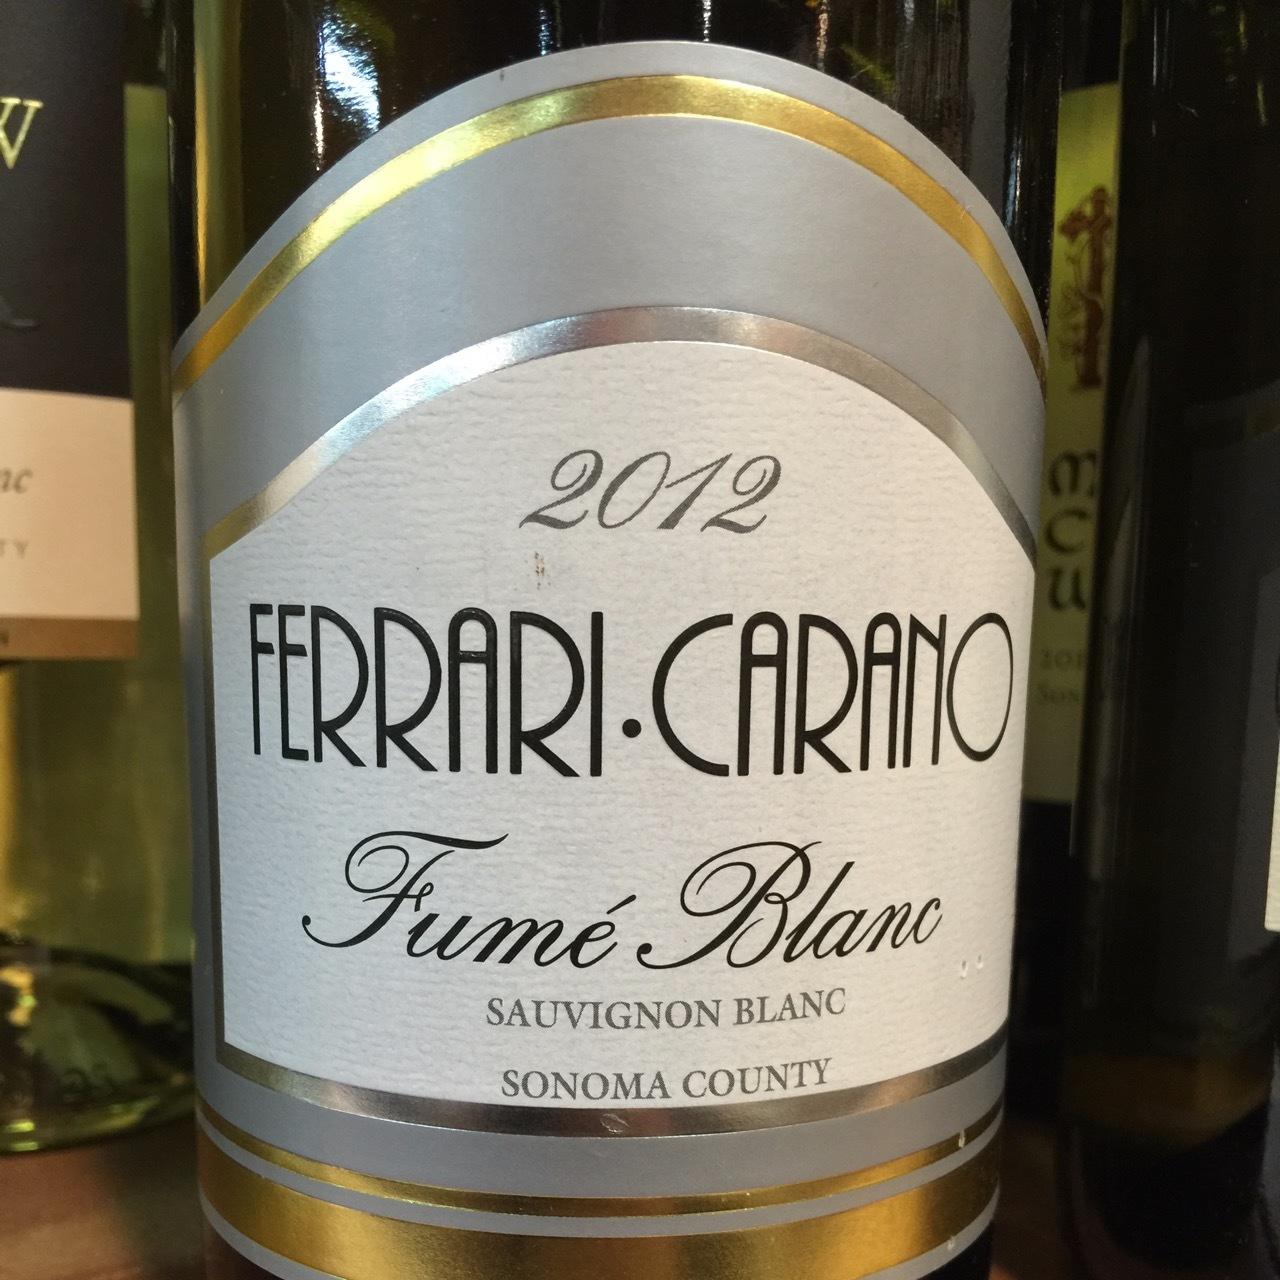 Ferrari Carano Sonoma County Fumé Blanc Sauvignon Blanc U2013 Whole Foods  Market 365   Akron